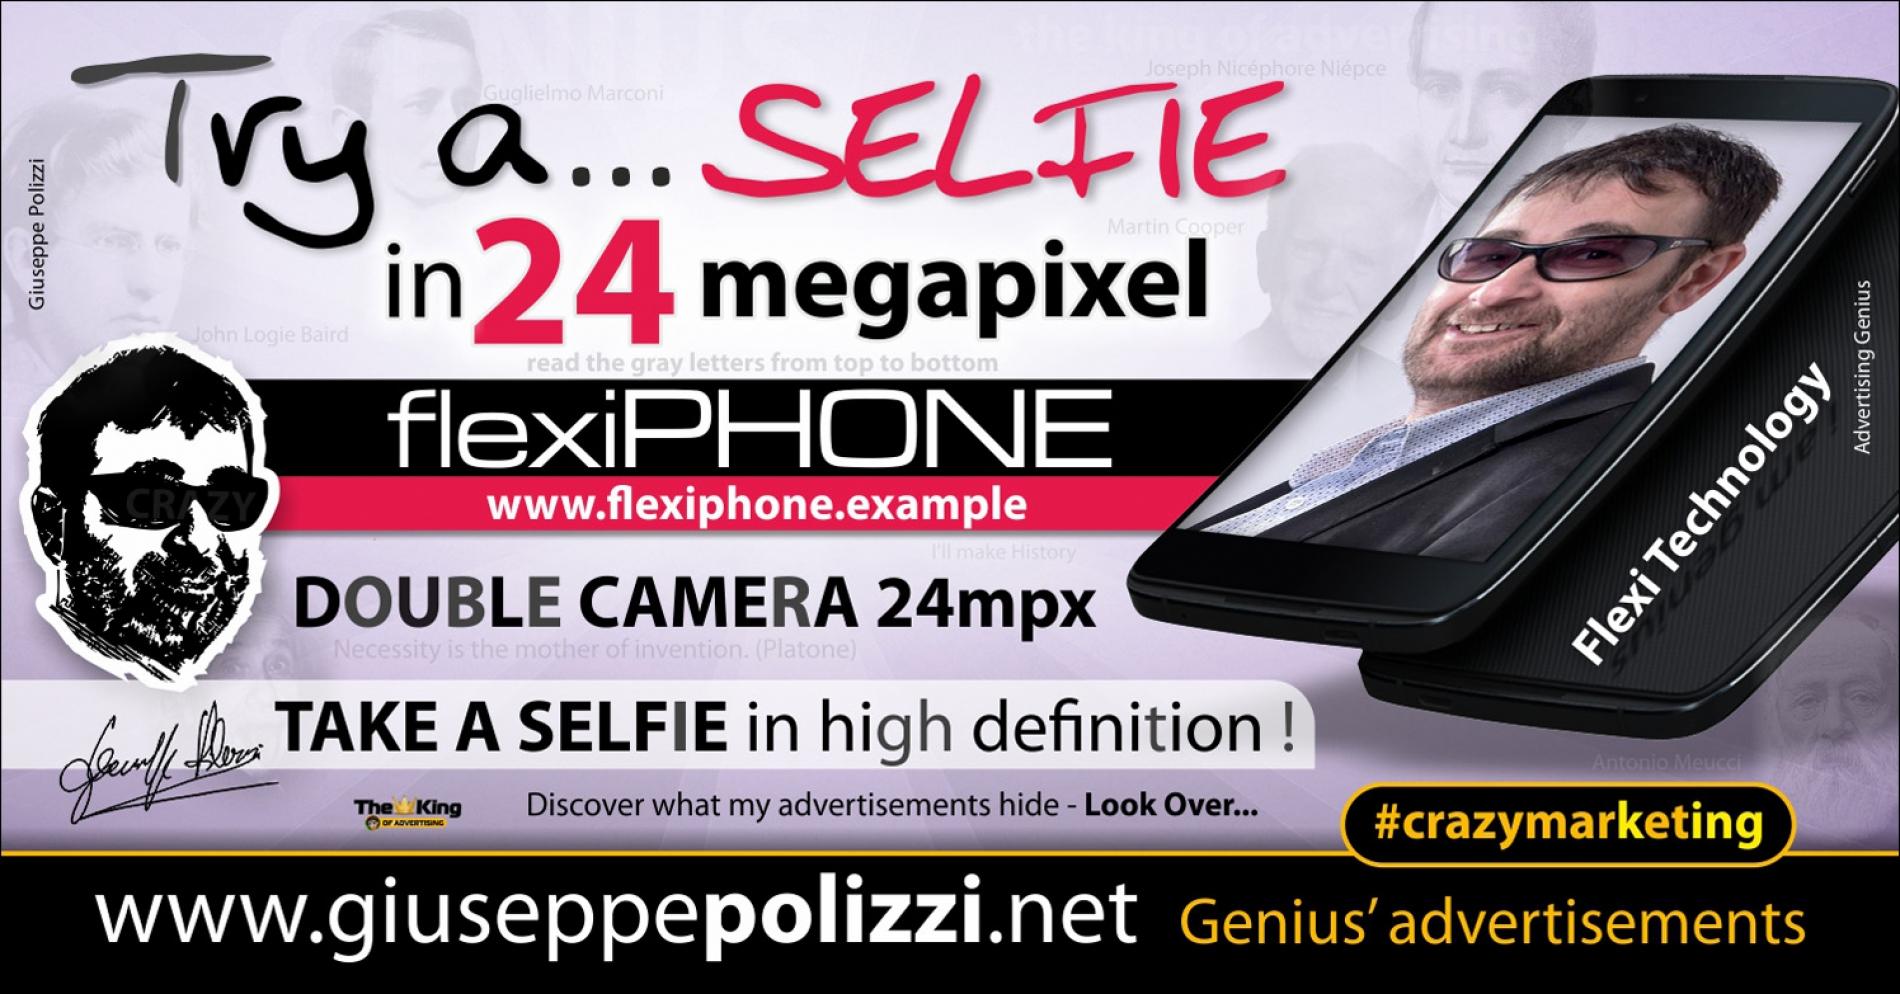 giuseppe polizzi advertisement Try a Selfie crazy marketing genius  2017